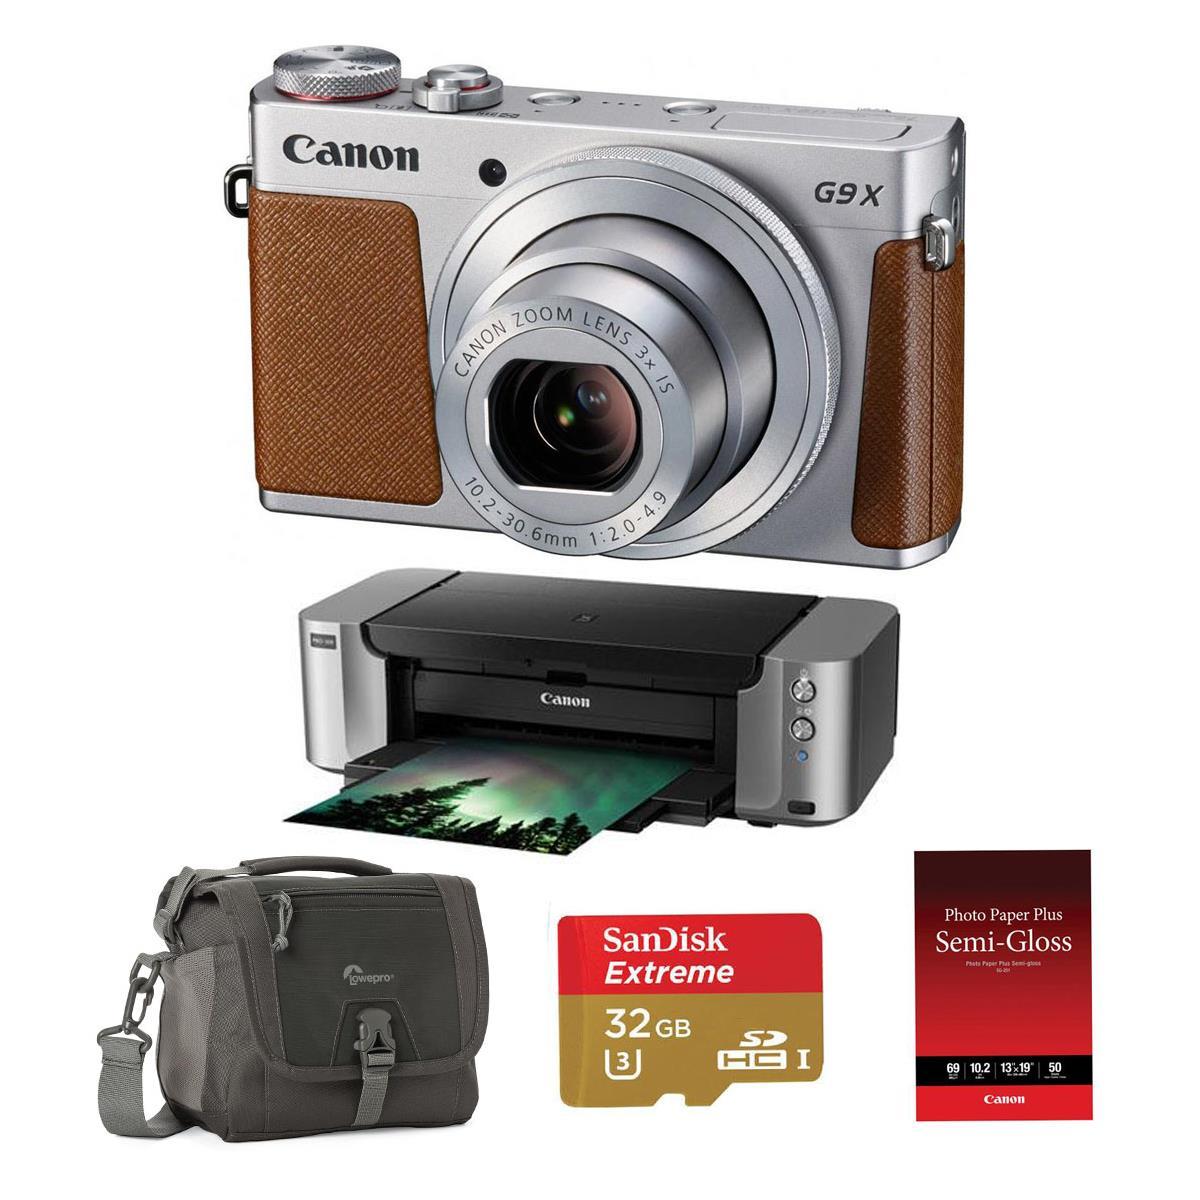 Canon G9 X + Pro-100 Printer + Photo Paper + 32gb SD card + bag for $350 AR from Adorama.com